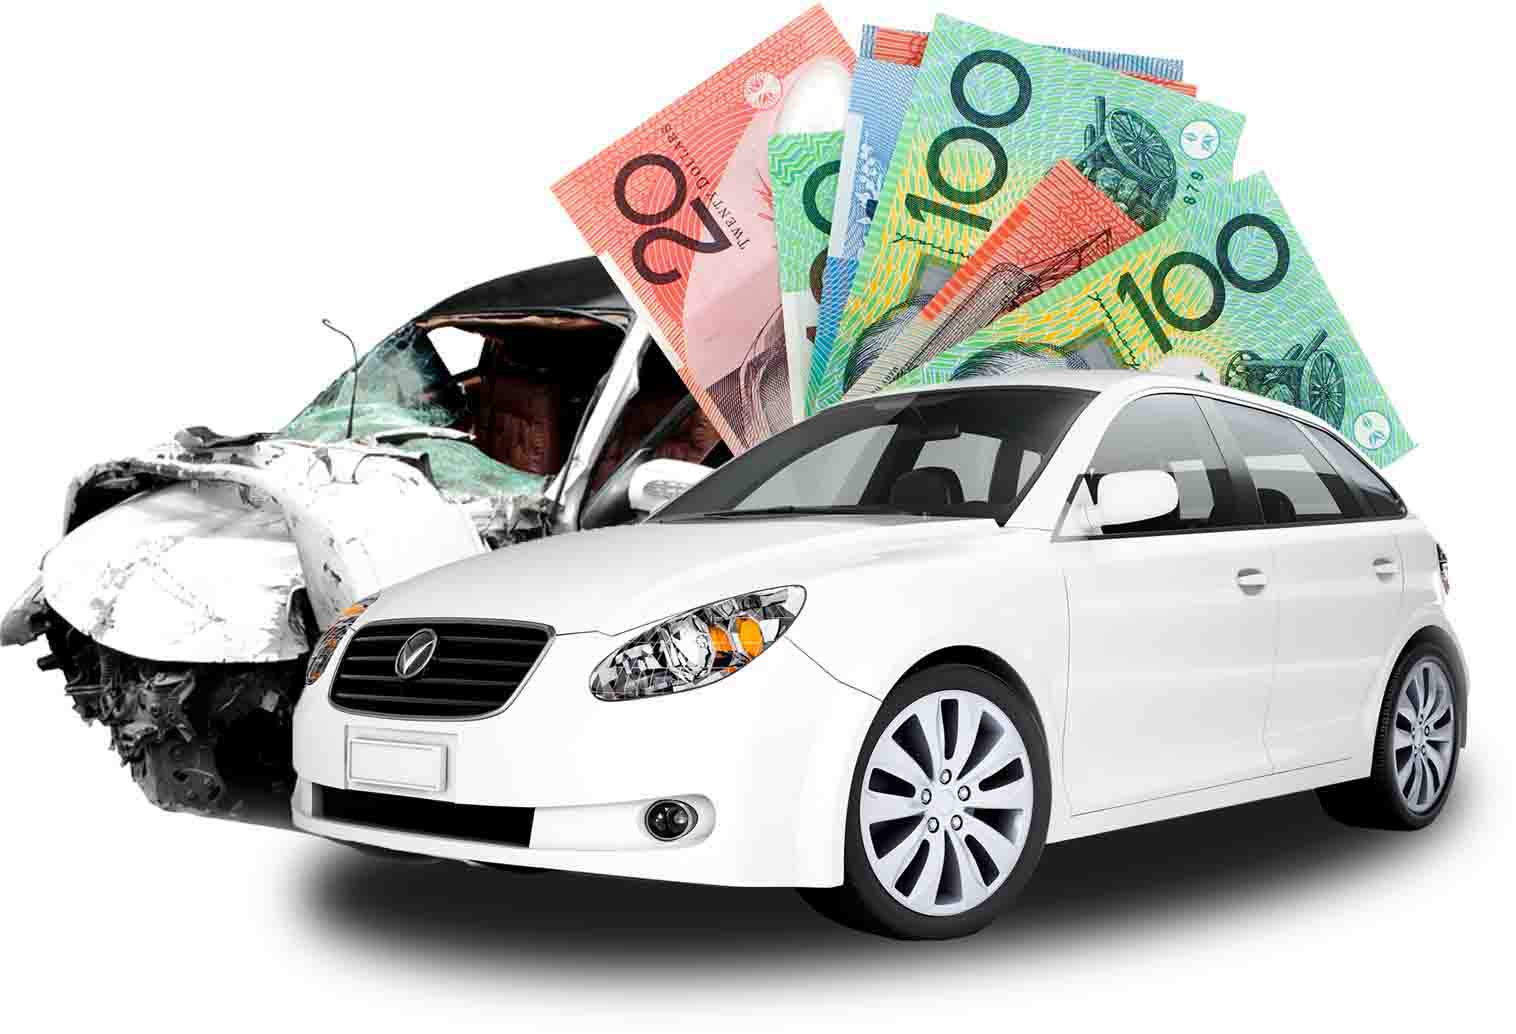 Cash For Scrap Cars Newcastle